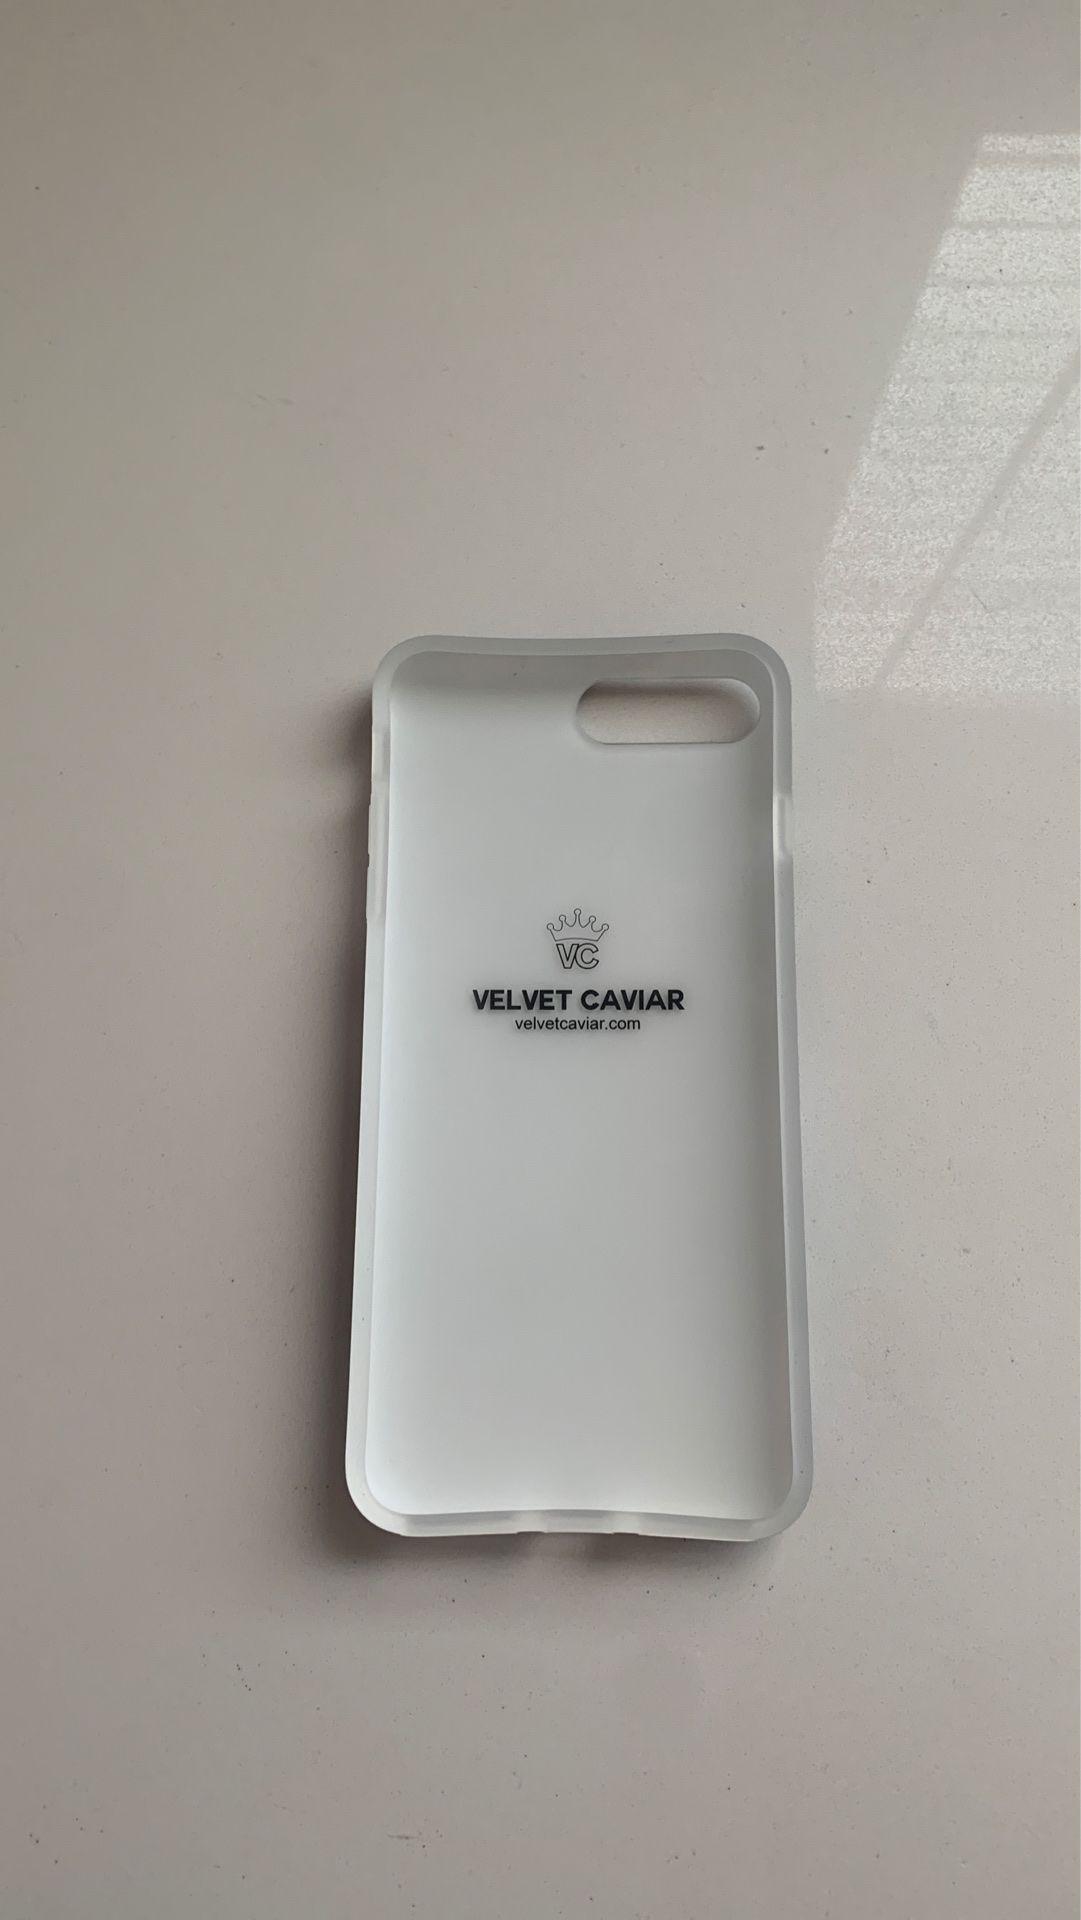 Velvet Caviar iPhone 8 / 7 plus Blue marble